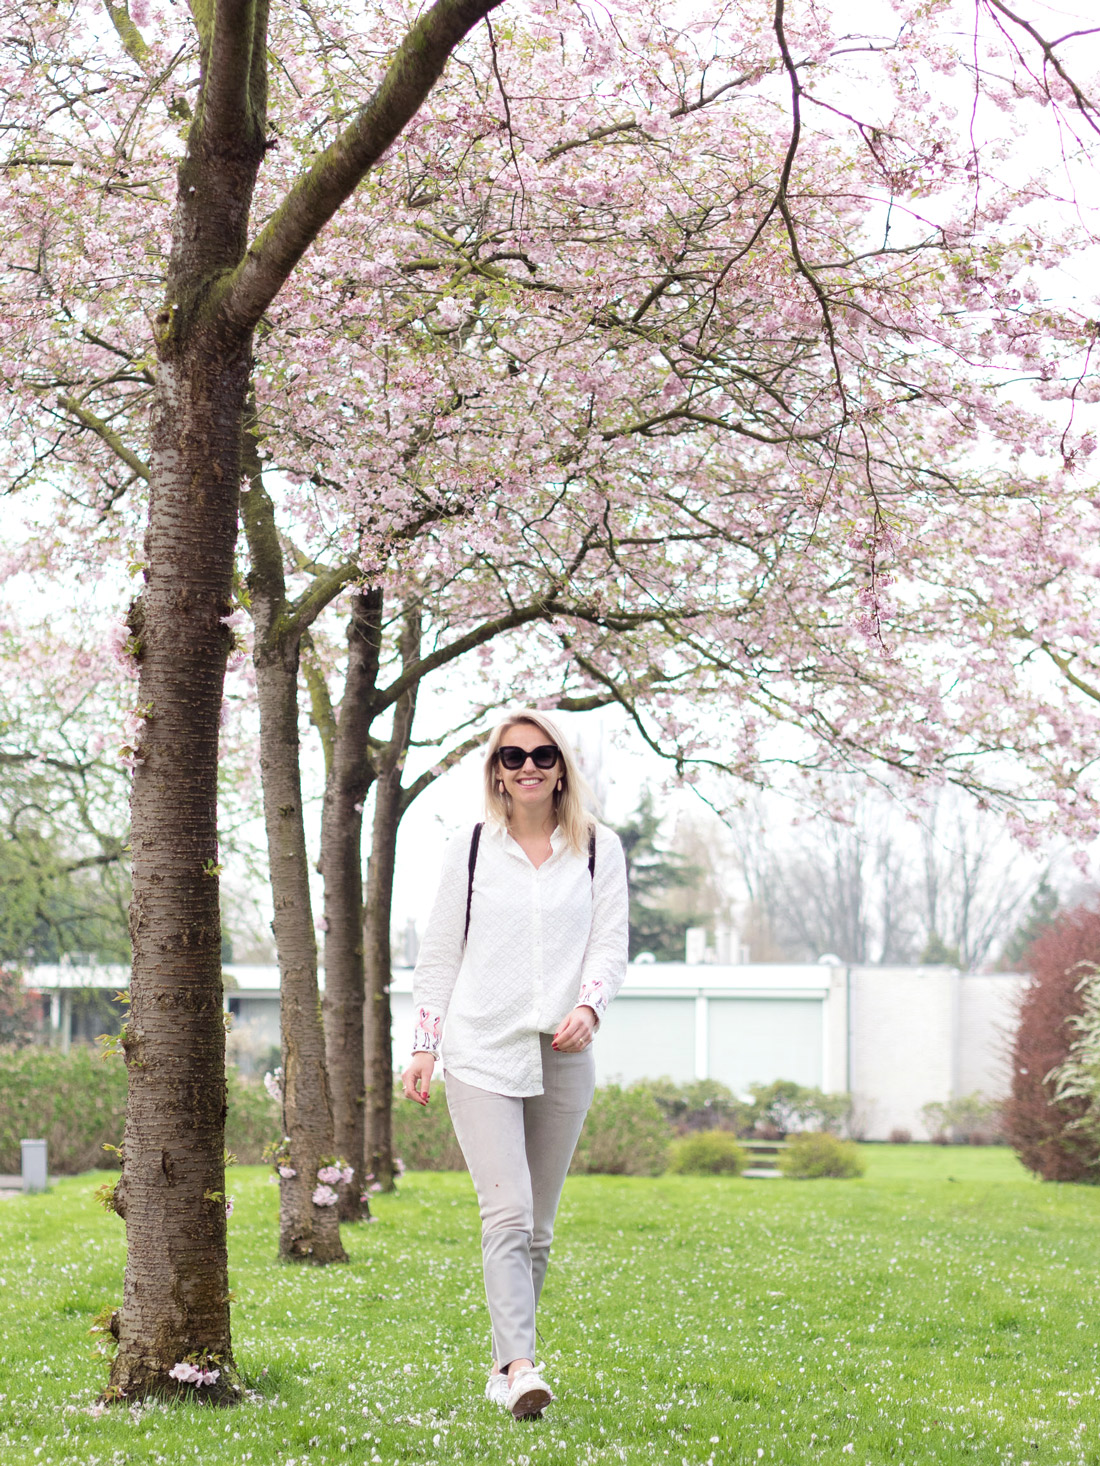 BAGATYOU_Susanne_Bavinck_Bender_Blogger_Fashion_Amsterdam_By_Marinke_Davelaar-Pregnancy-Style